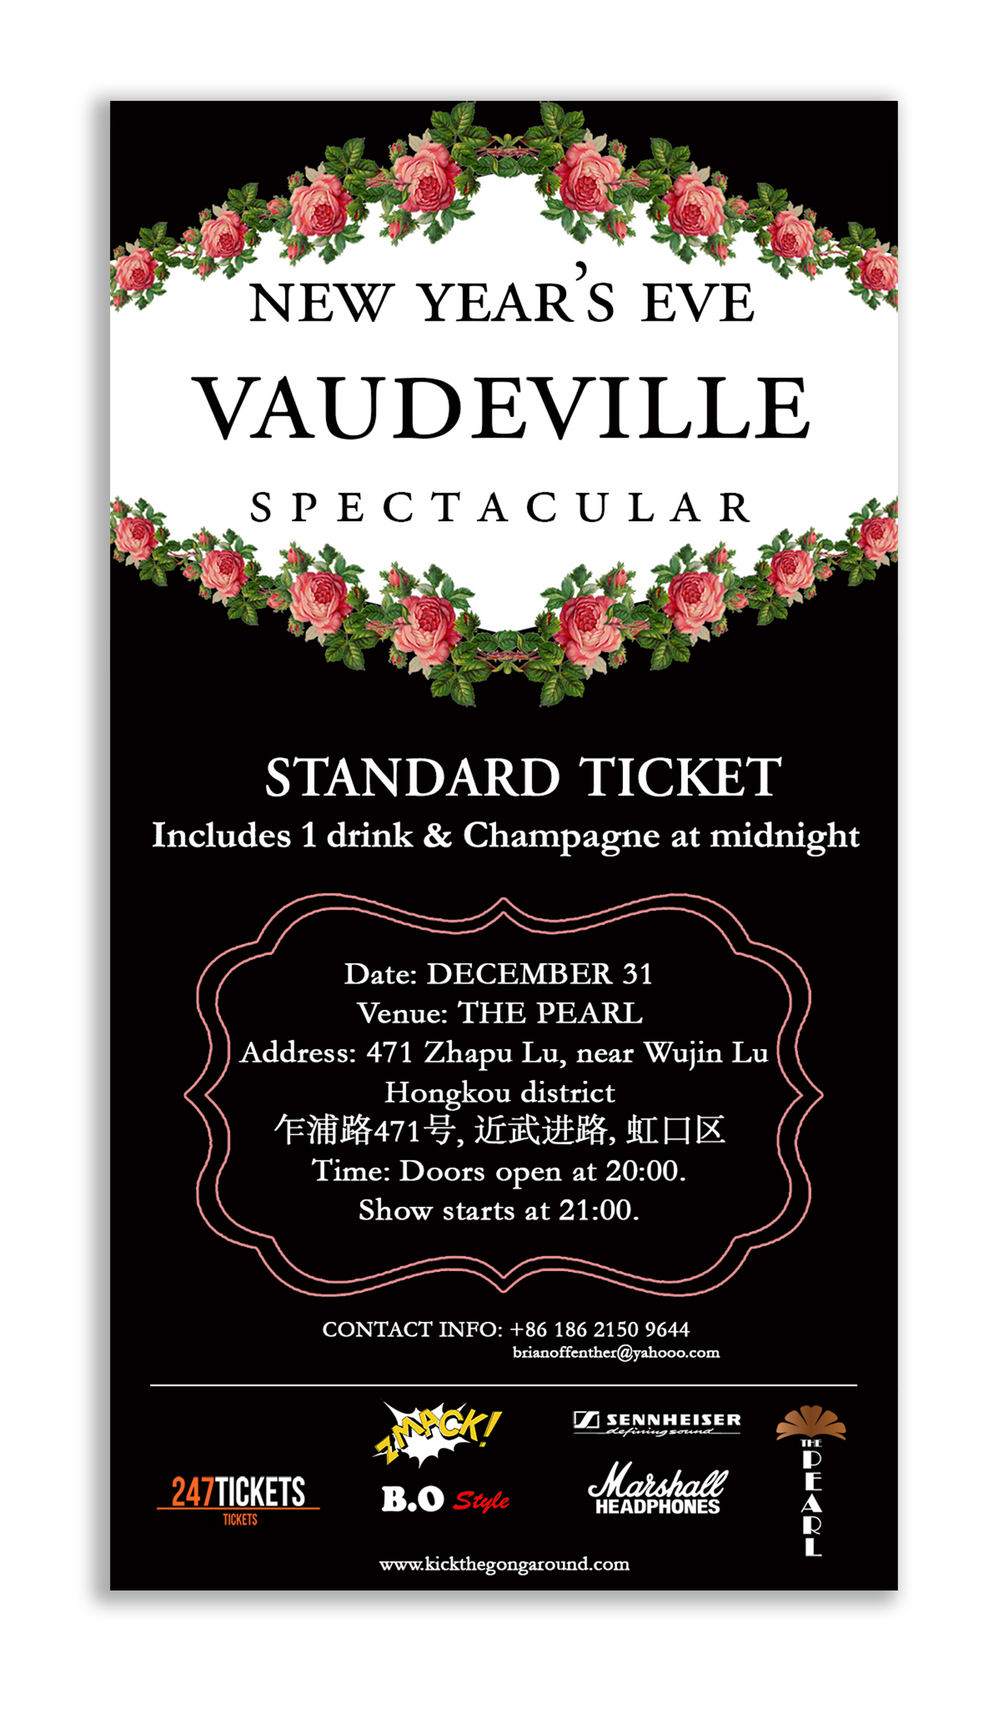 Vaudeville spectacular